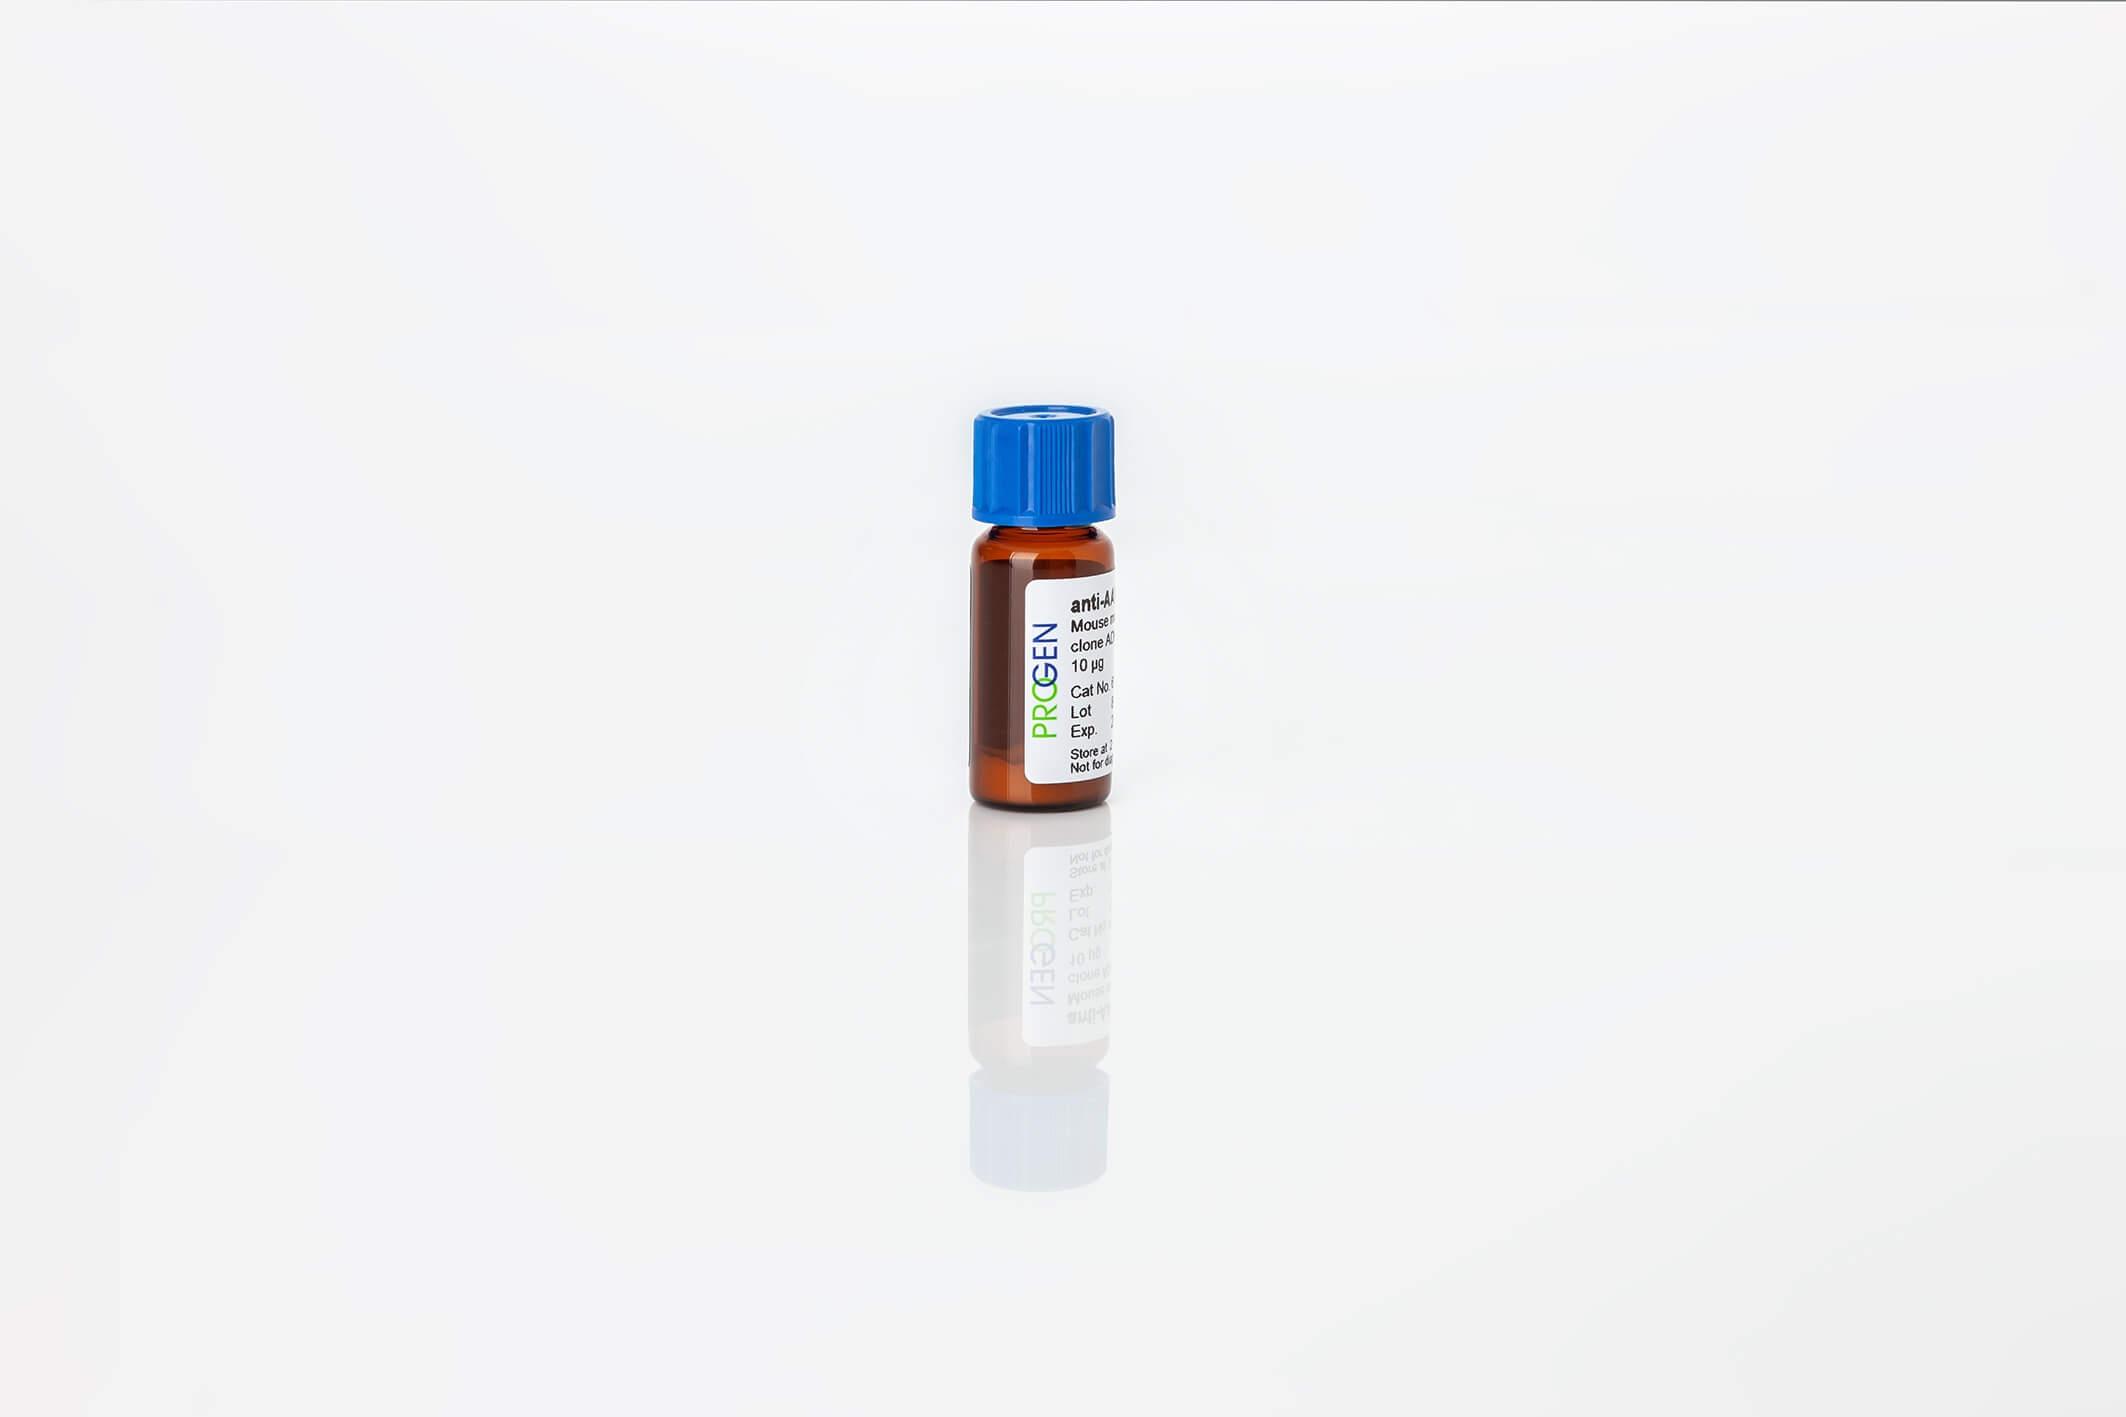 anti-Nitric Oxide Synthase (C-terminus) guinea pig polyclonal, serum